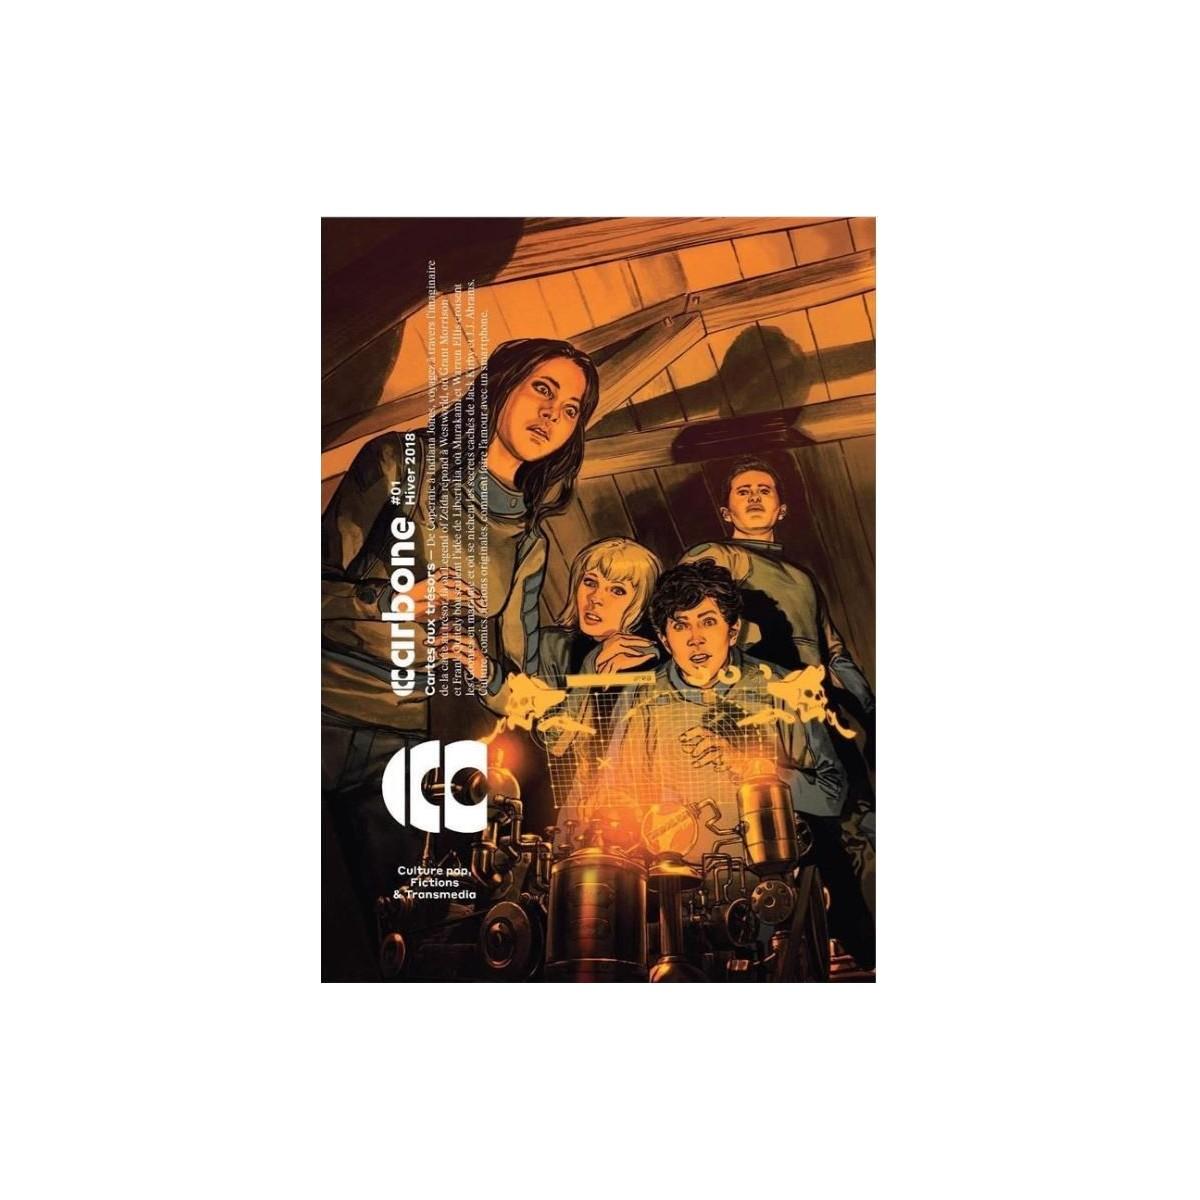 Carbone 01 - Transmedia magazine